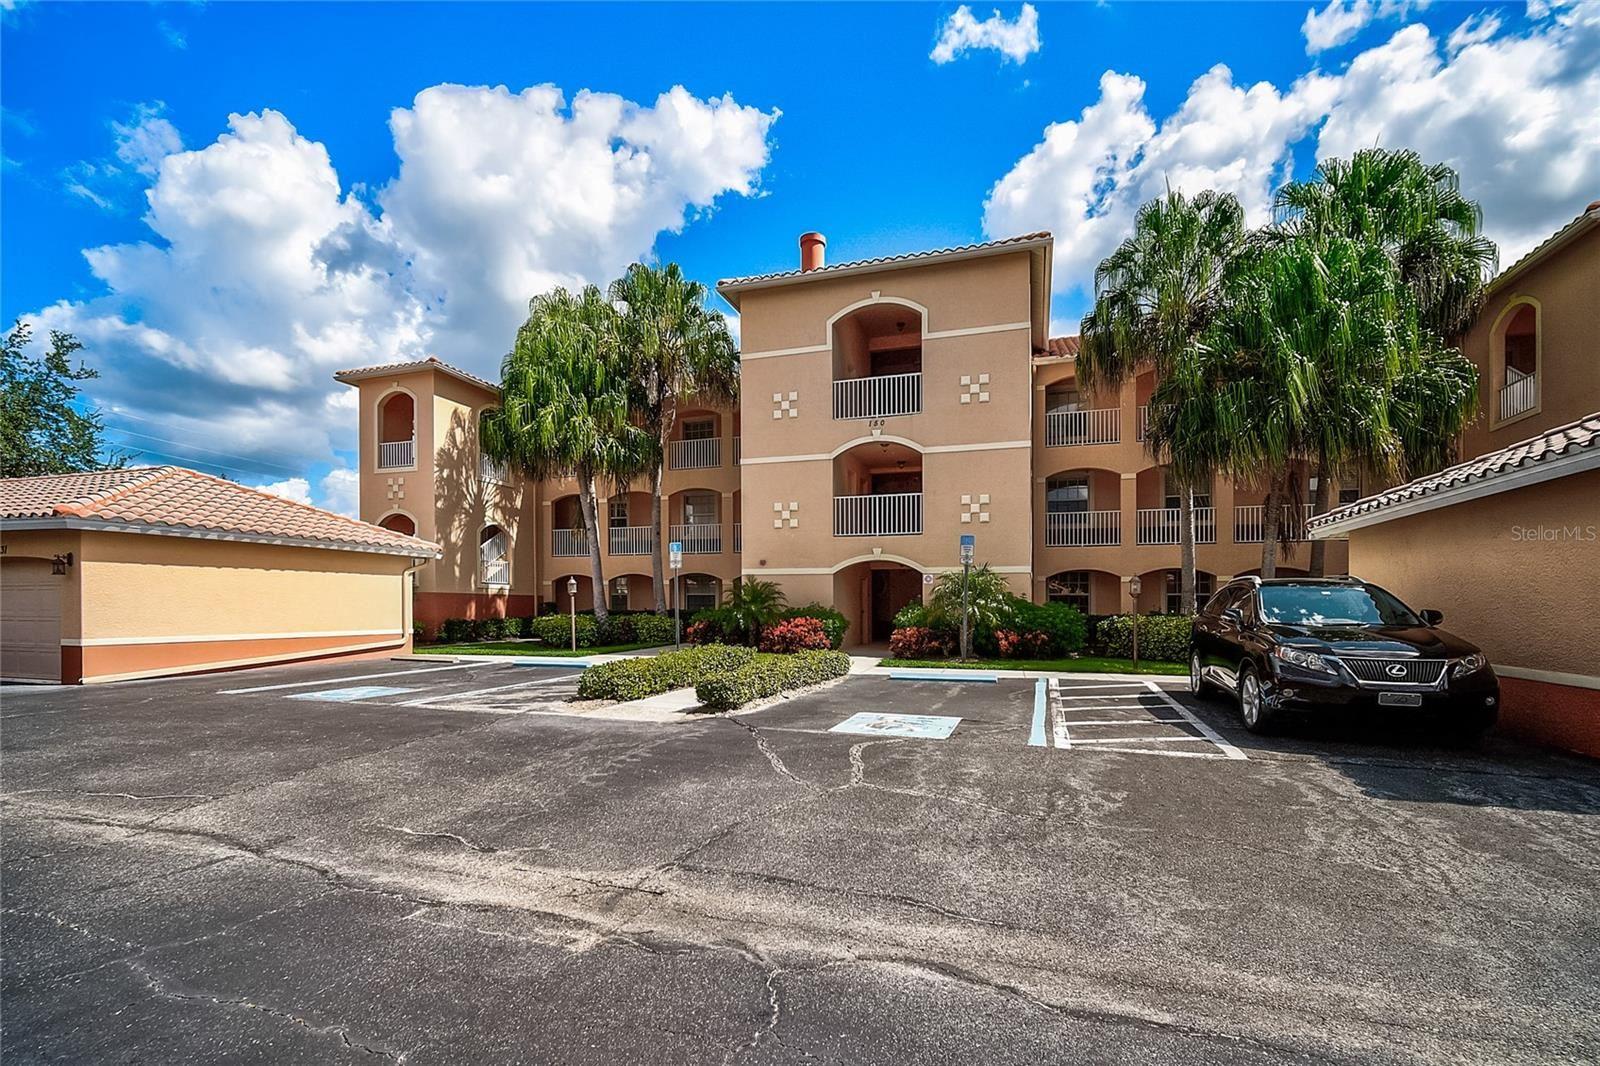 Photo of 150 L PAVIA BLVD #32, VENICE, FL 34292 (MLS # A4512490)